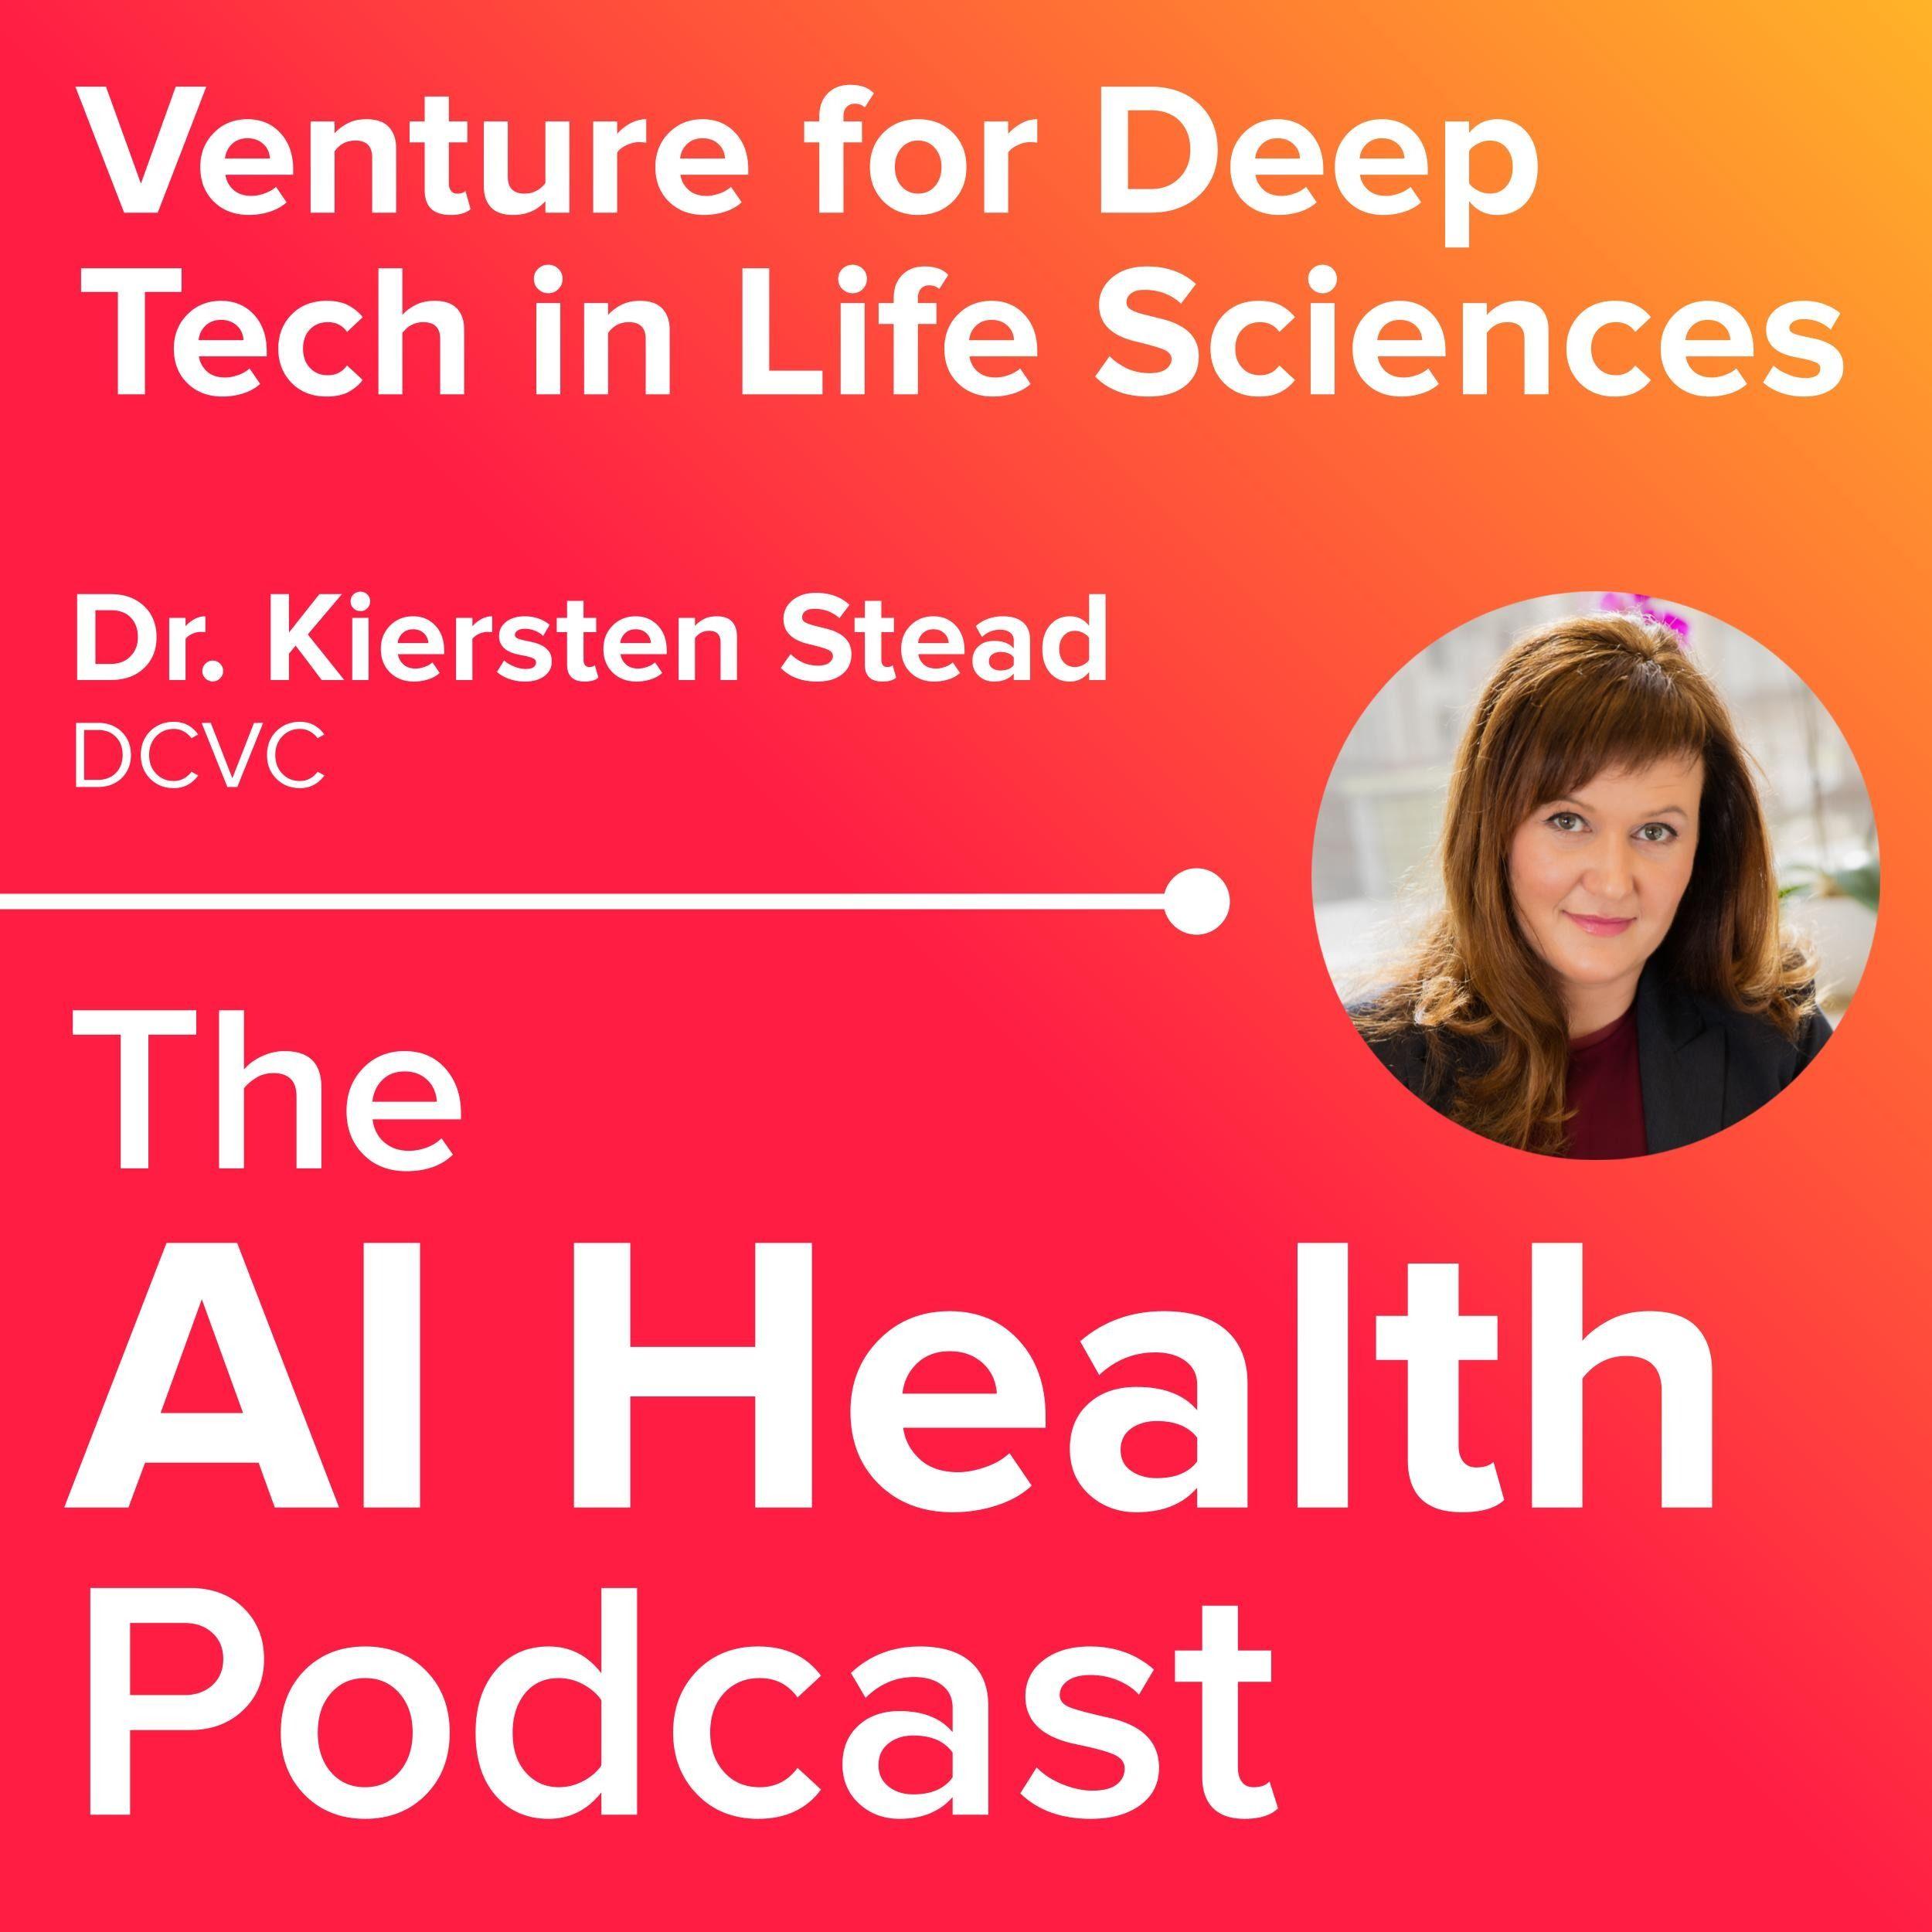 DCVC's Dr. Kiersten Stead on Venture for Deep Tech in Life Sciences